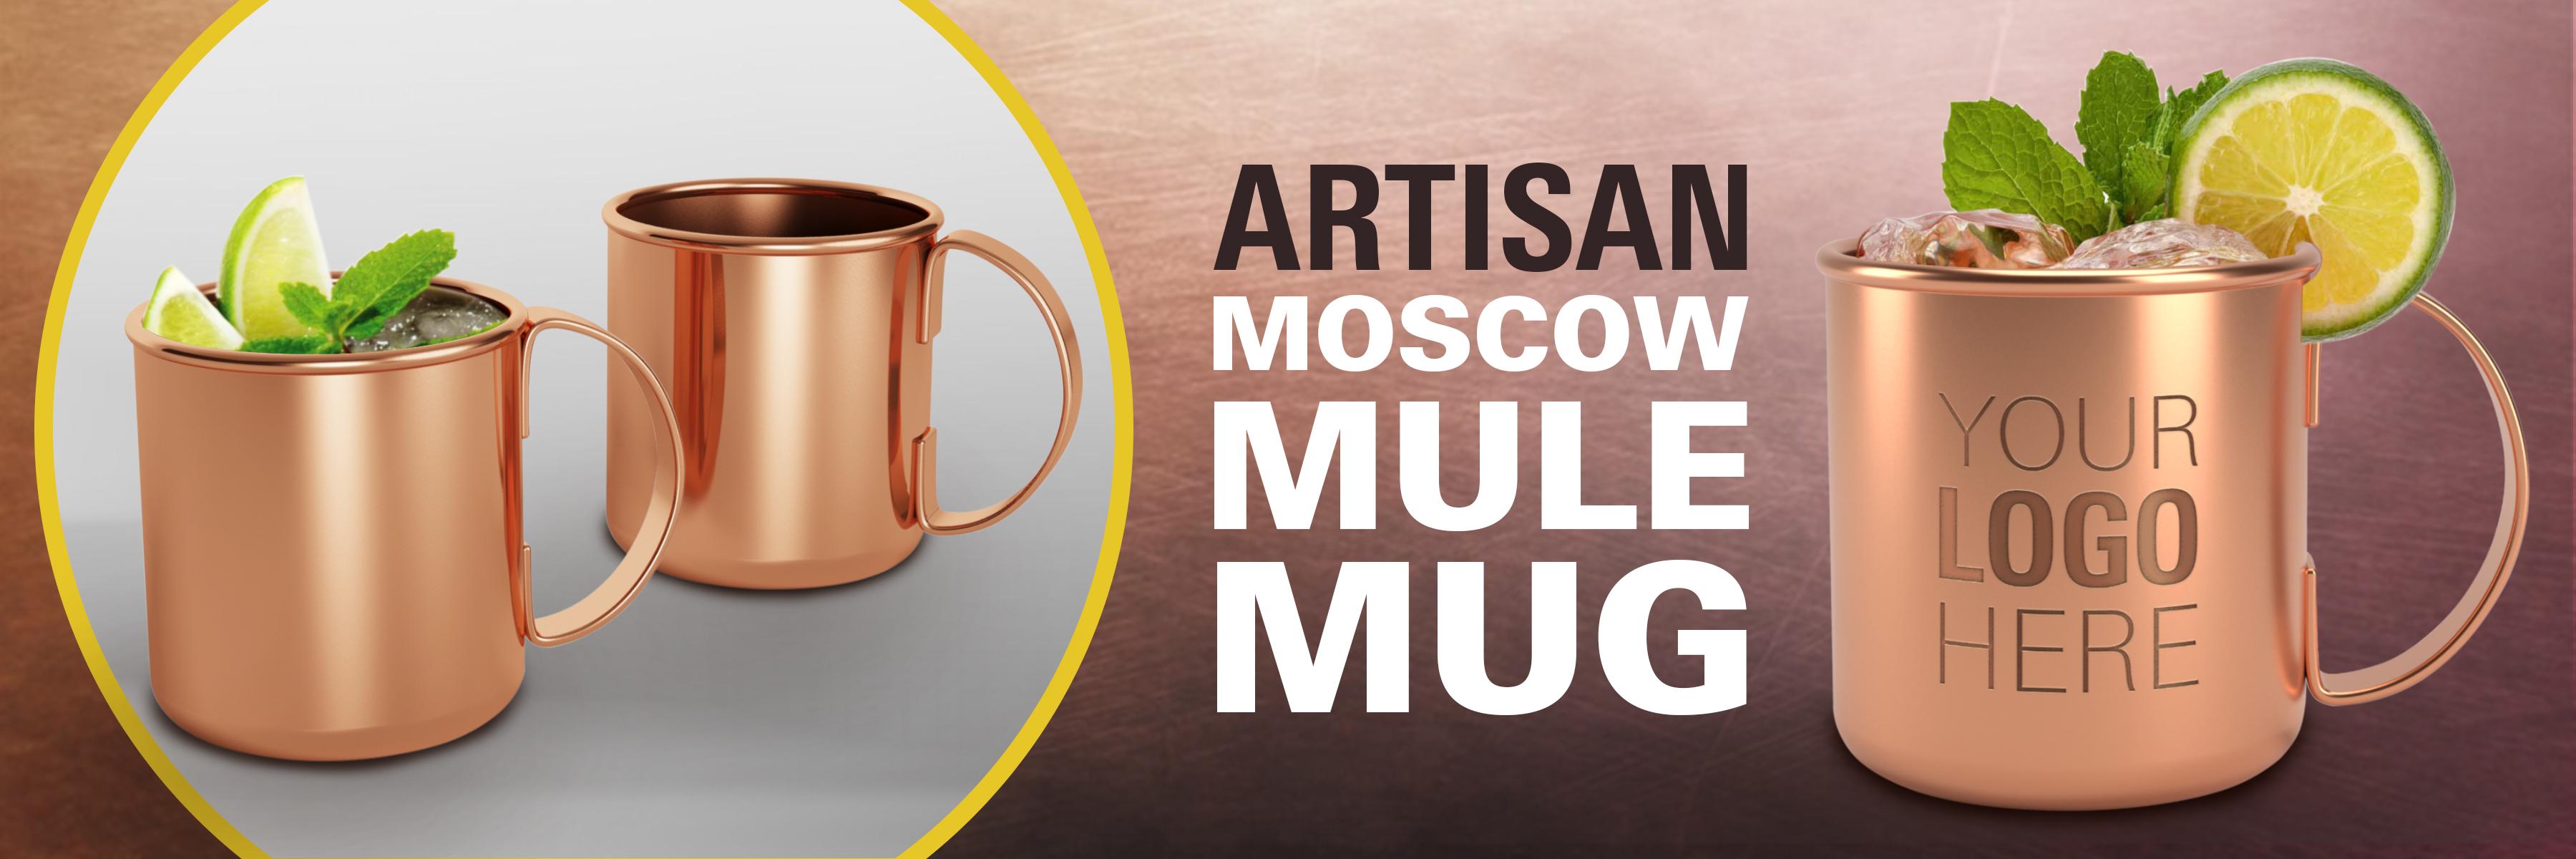 Artisan Copper Moscow Mule Mug